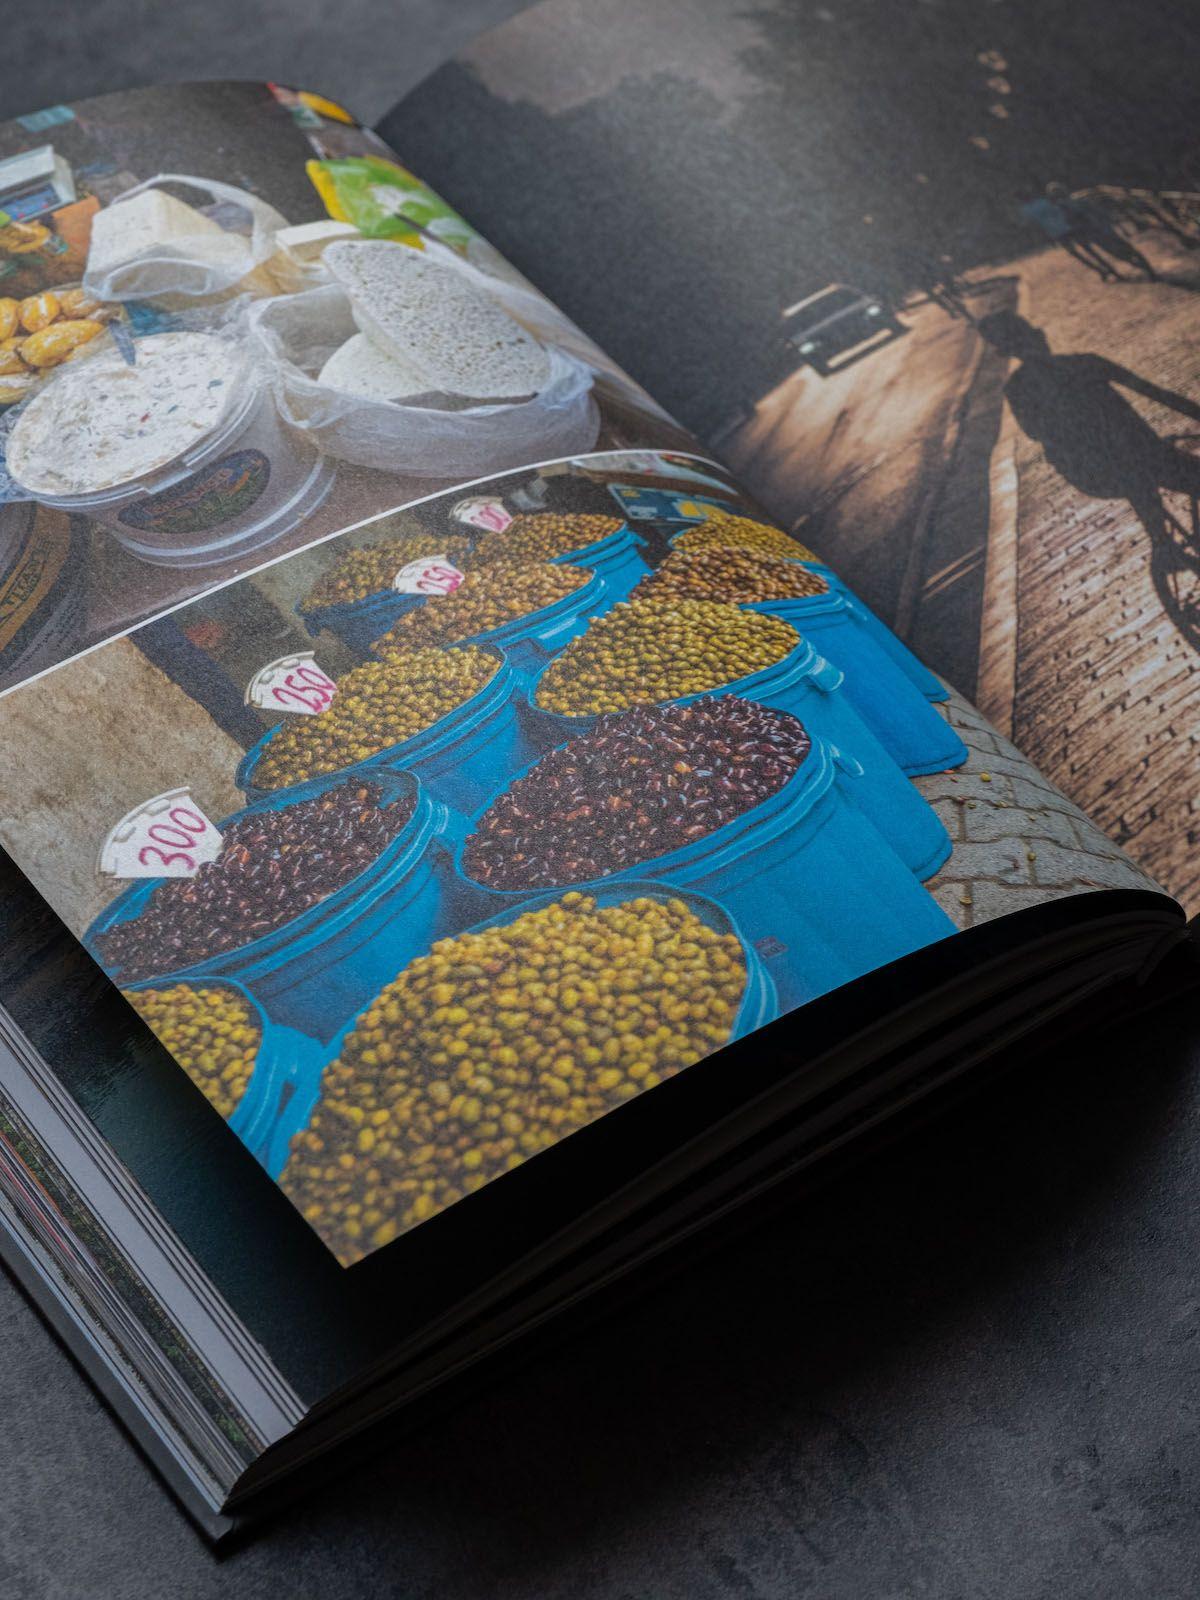 Leckerbissen About Fuel Foodblog Bledar Kola Kochbuch, Oliven, Käse